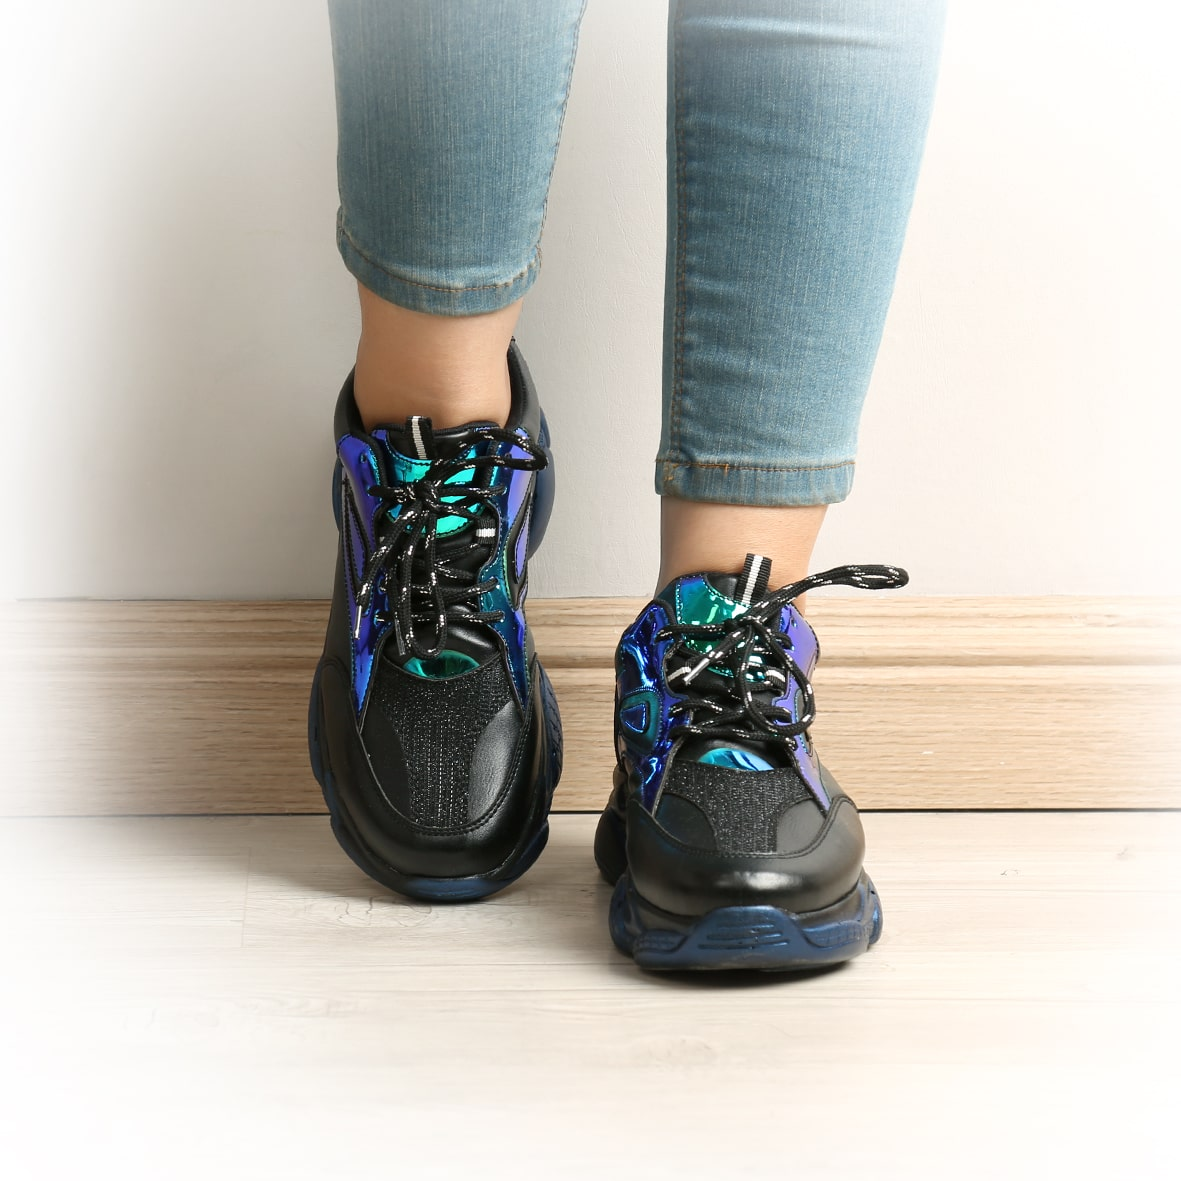 کفش زنانه اسپرت چشمی مگسی مشکی | Fly's eye Woman's Sport Shoes